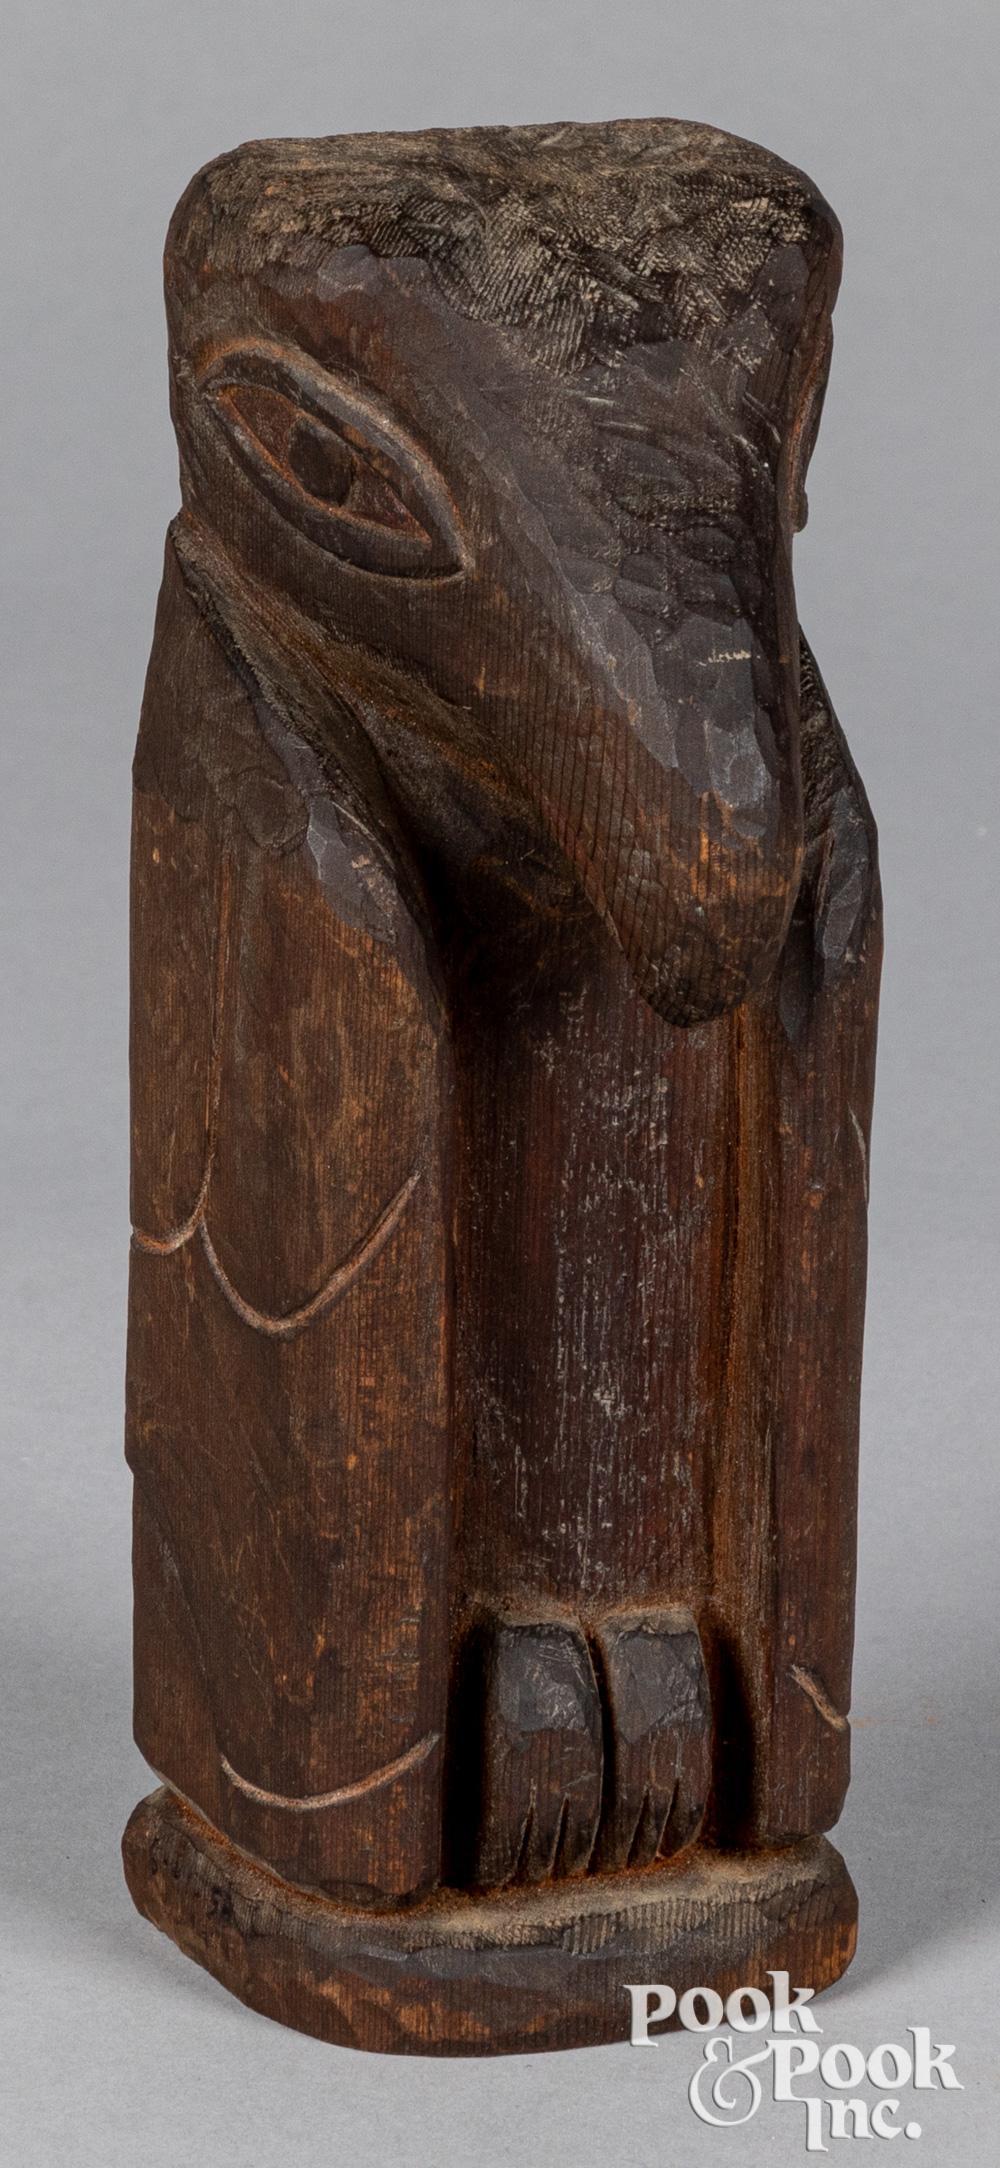 Native American Indian redwood raven totem figure